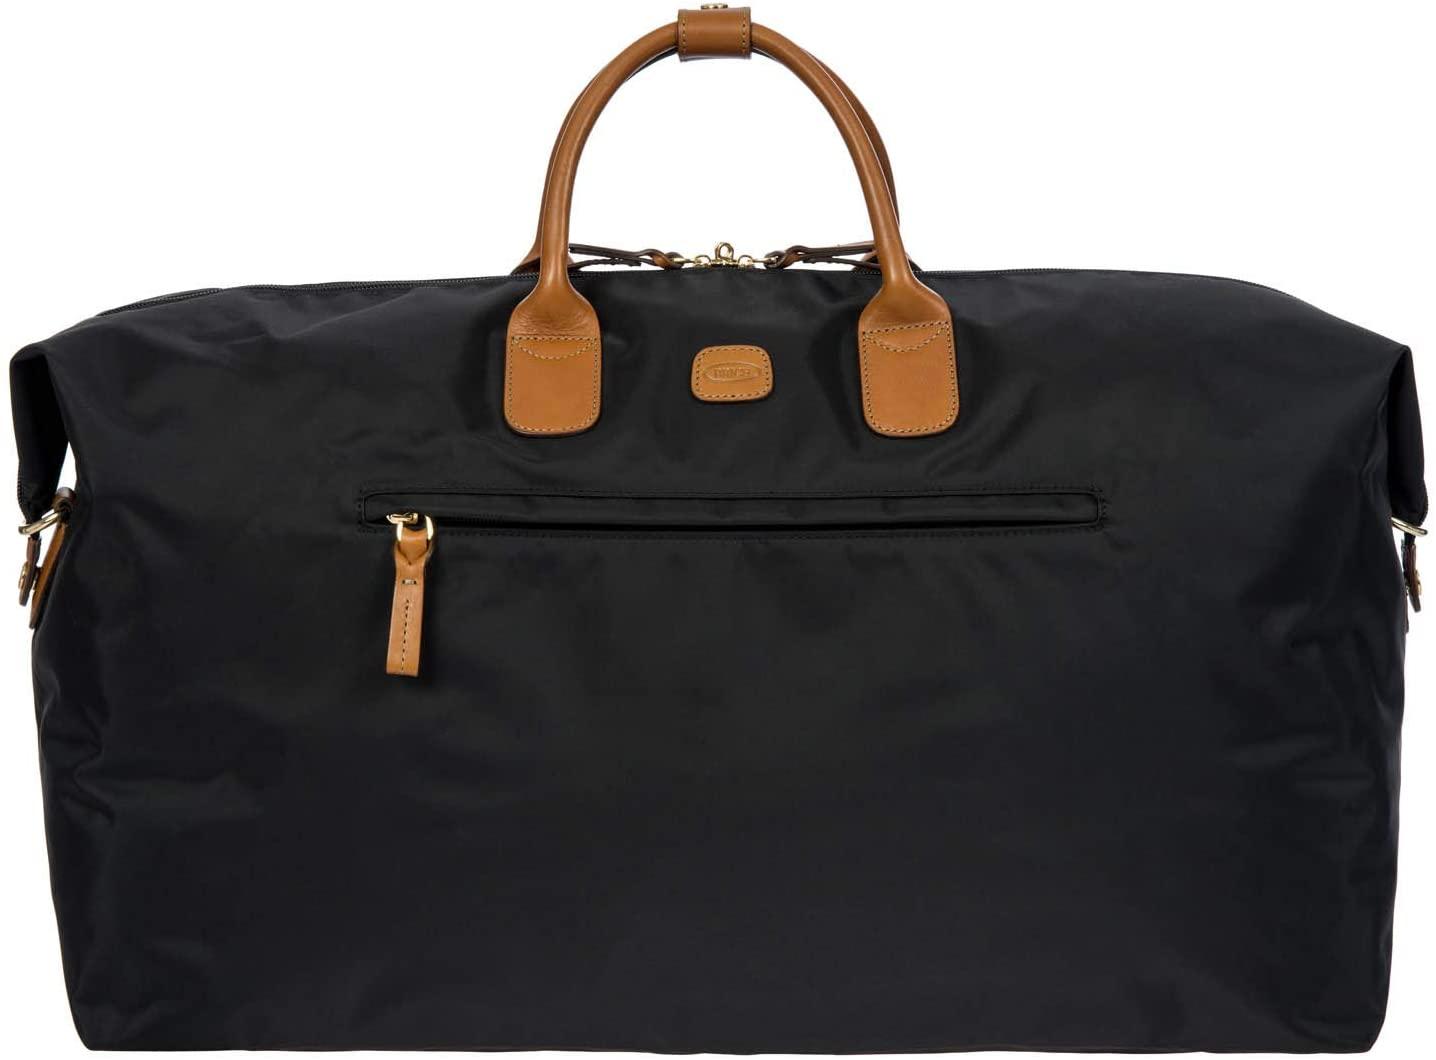 Bric's USA Luggage Model: X-BAG/X-TRAVEL |Size: 22